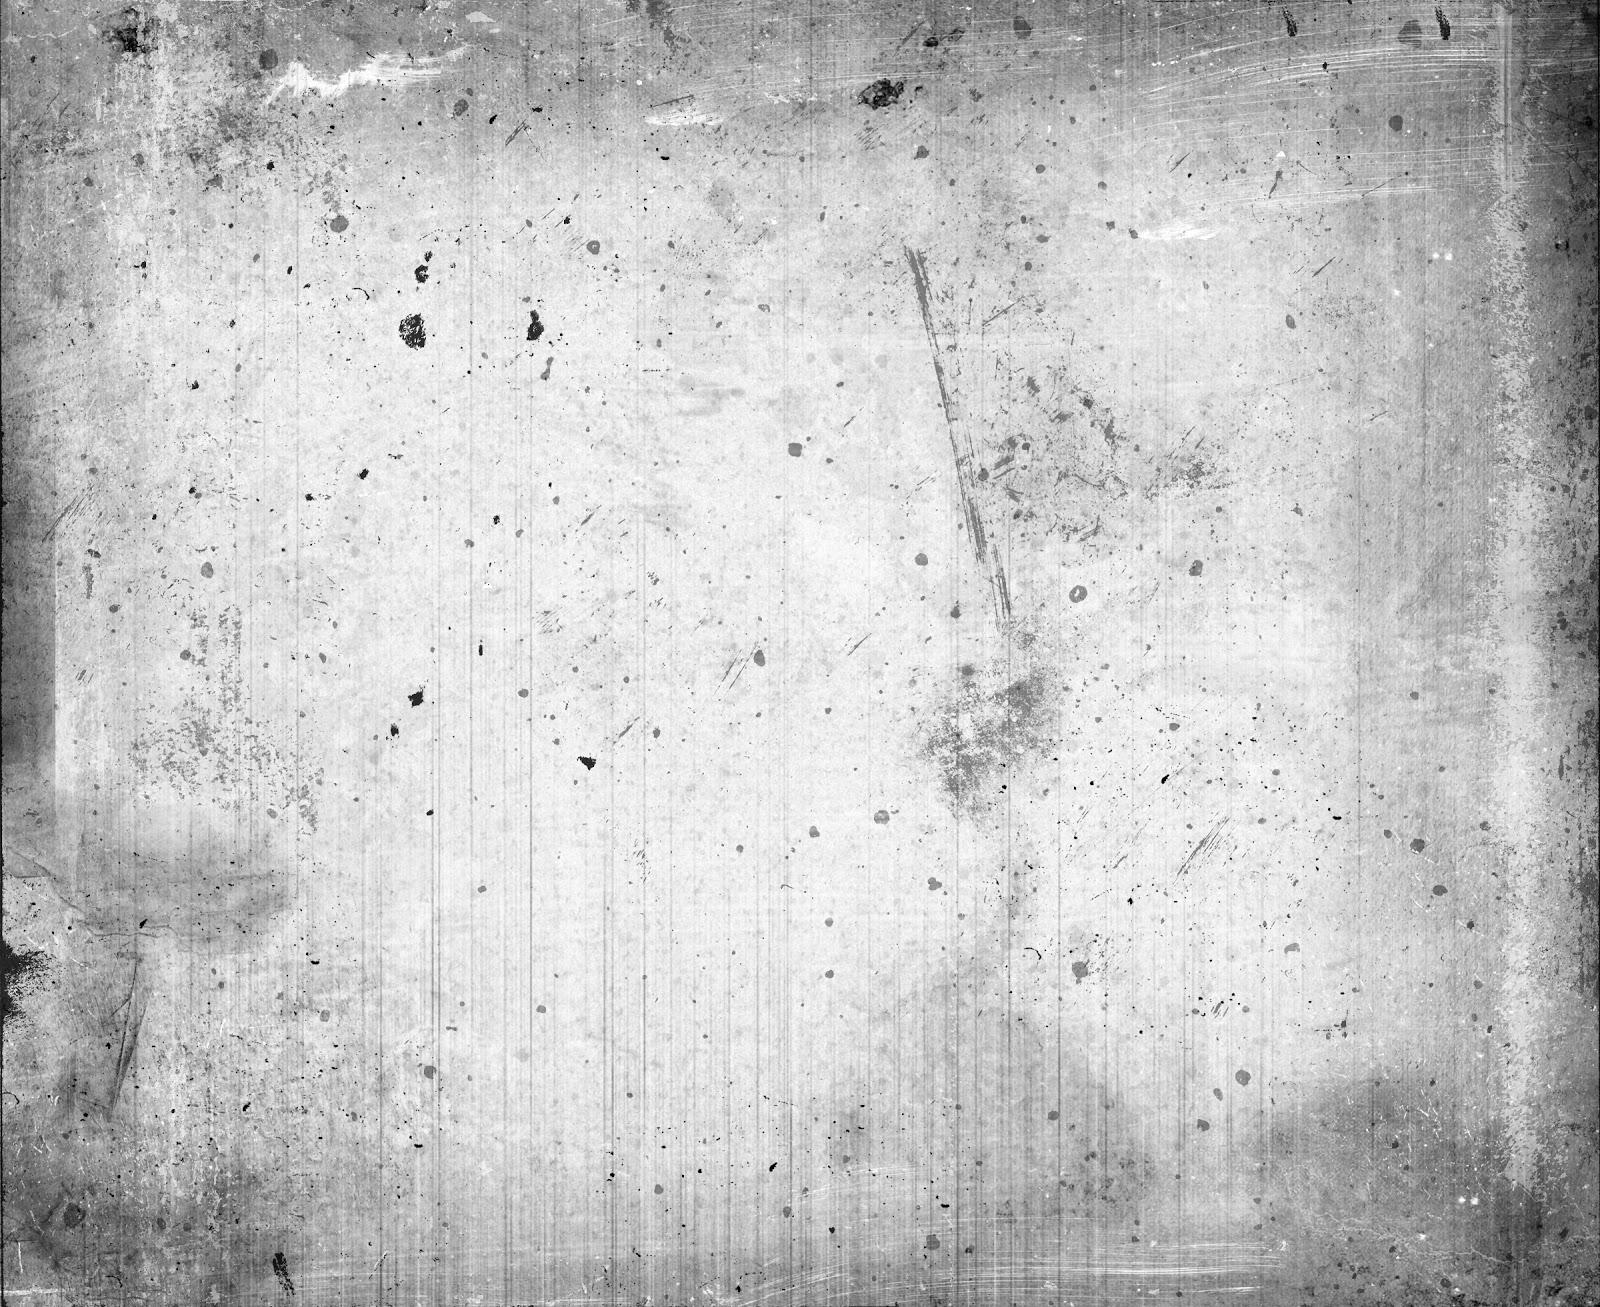 Dark Textures clipart blue texture background Com/file/retro com/file/retro Pinterest psdgraphics by